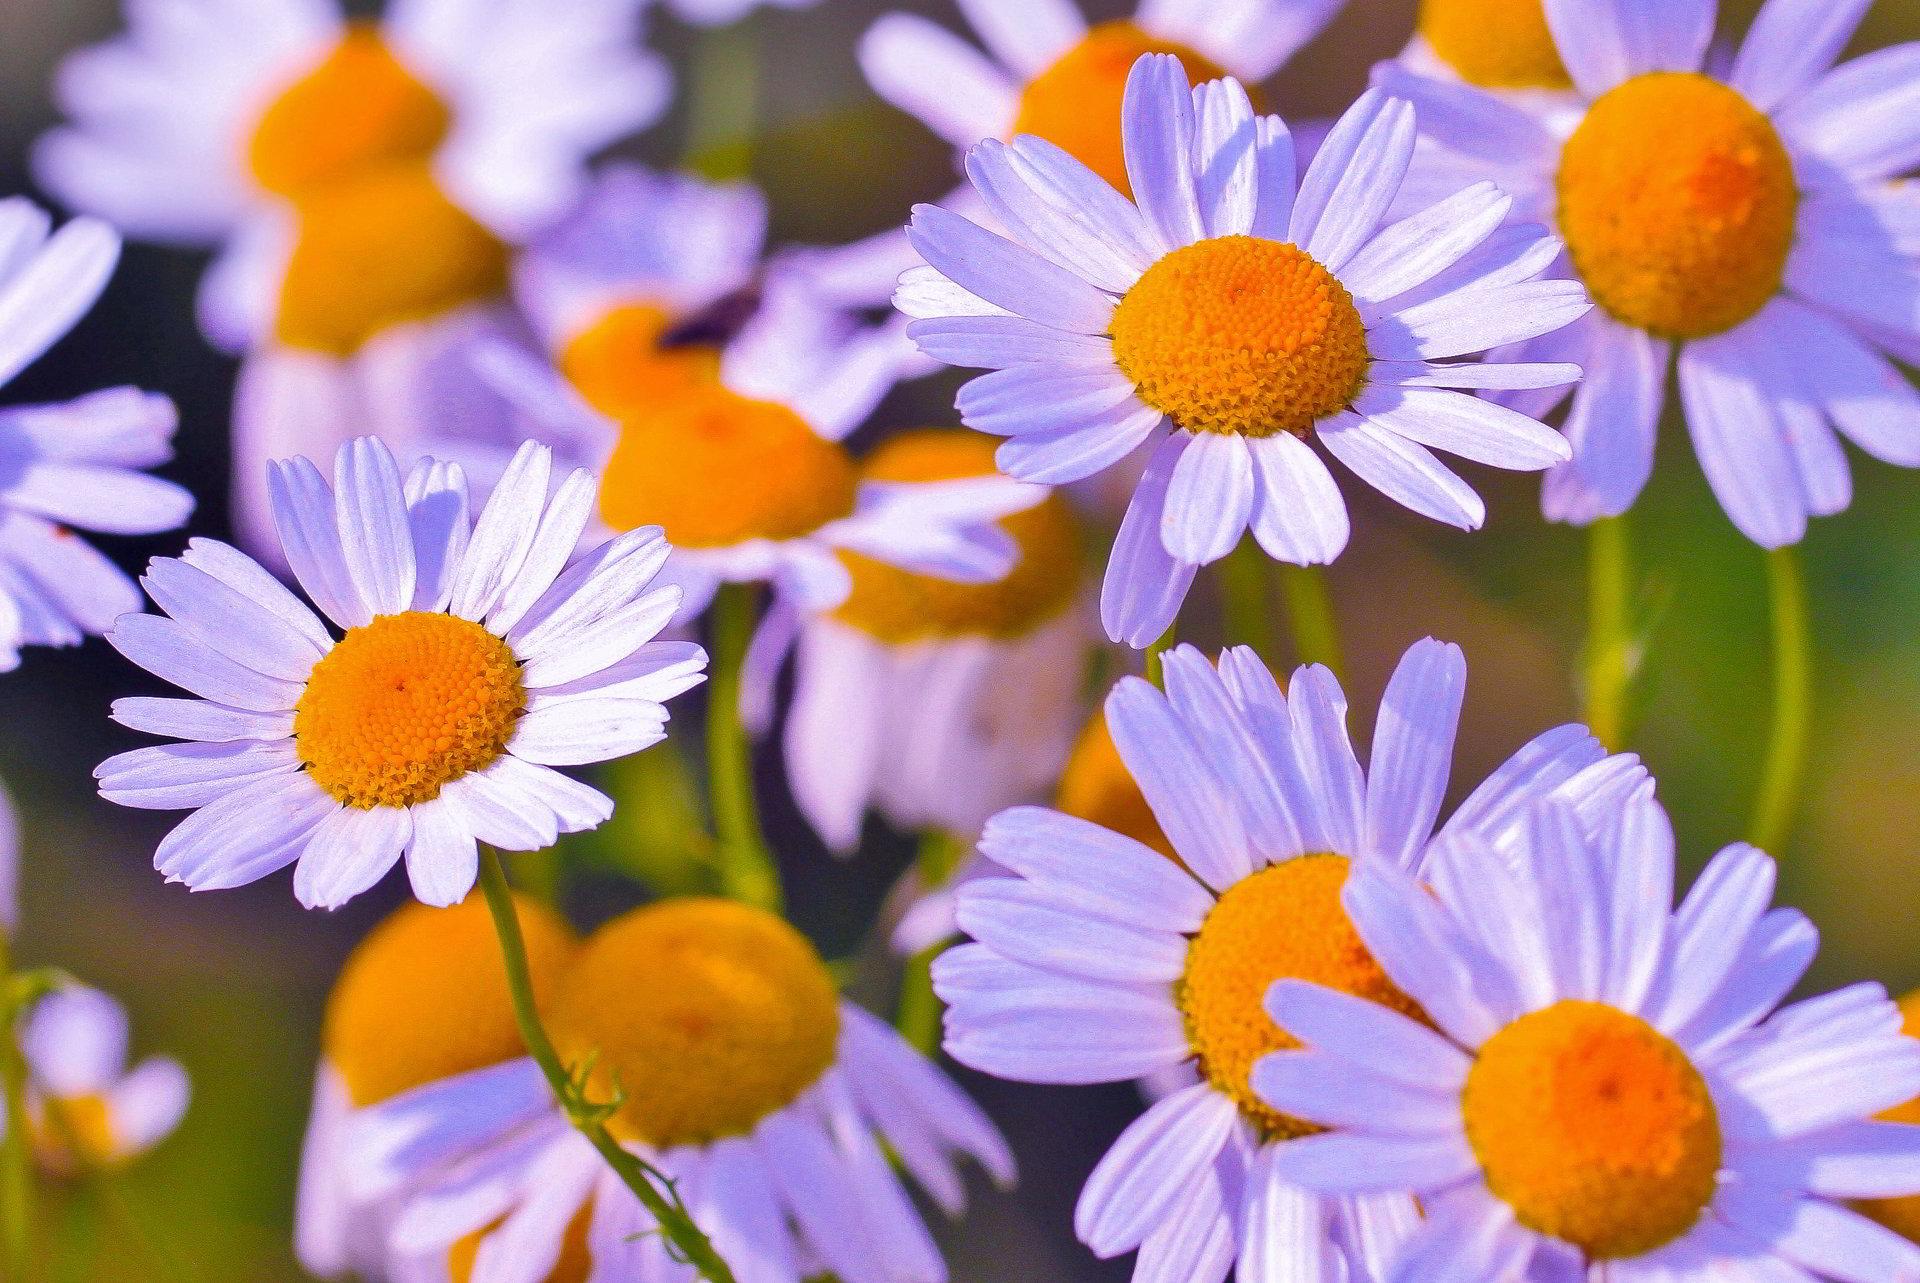 hinh anh hoa cuc dep 65